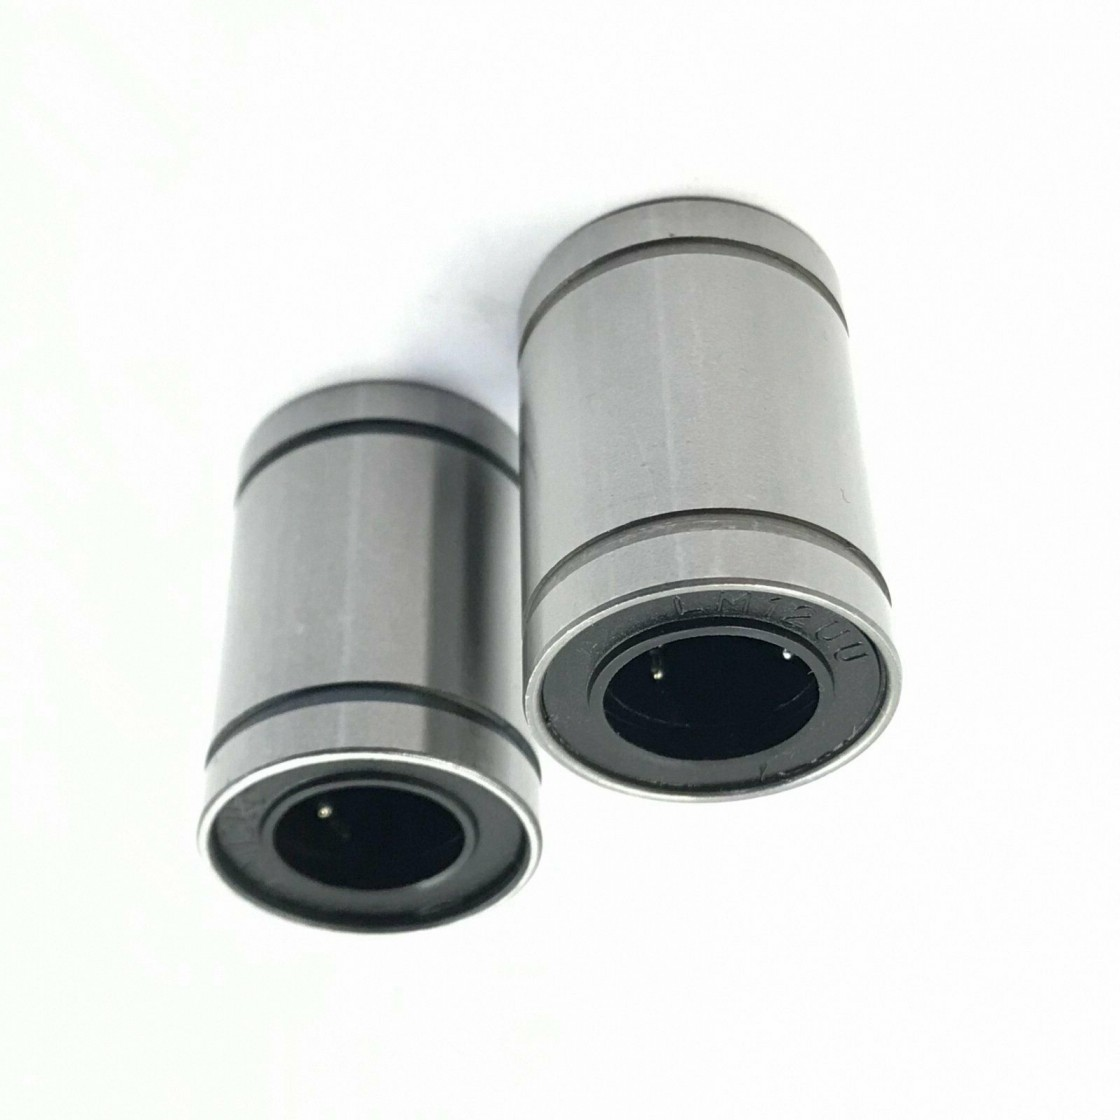 Linear Motion Bearing (LM12uu, LM13uu, LM16uu, LM20uu, LM25uu) for Printing Machinery by Cixi Kent Bearing Manufactory